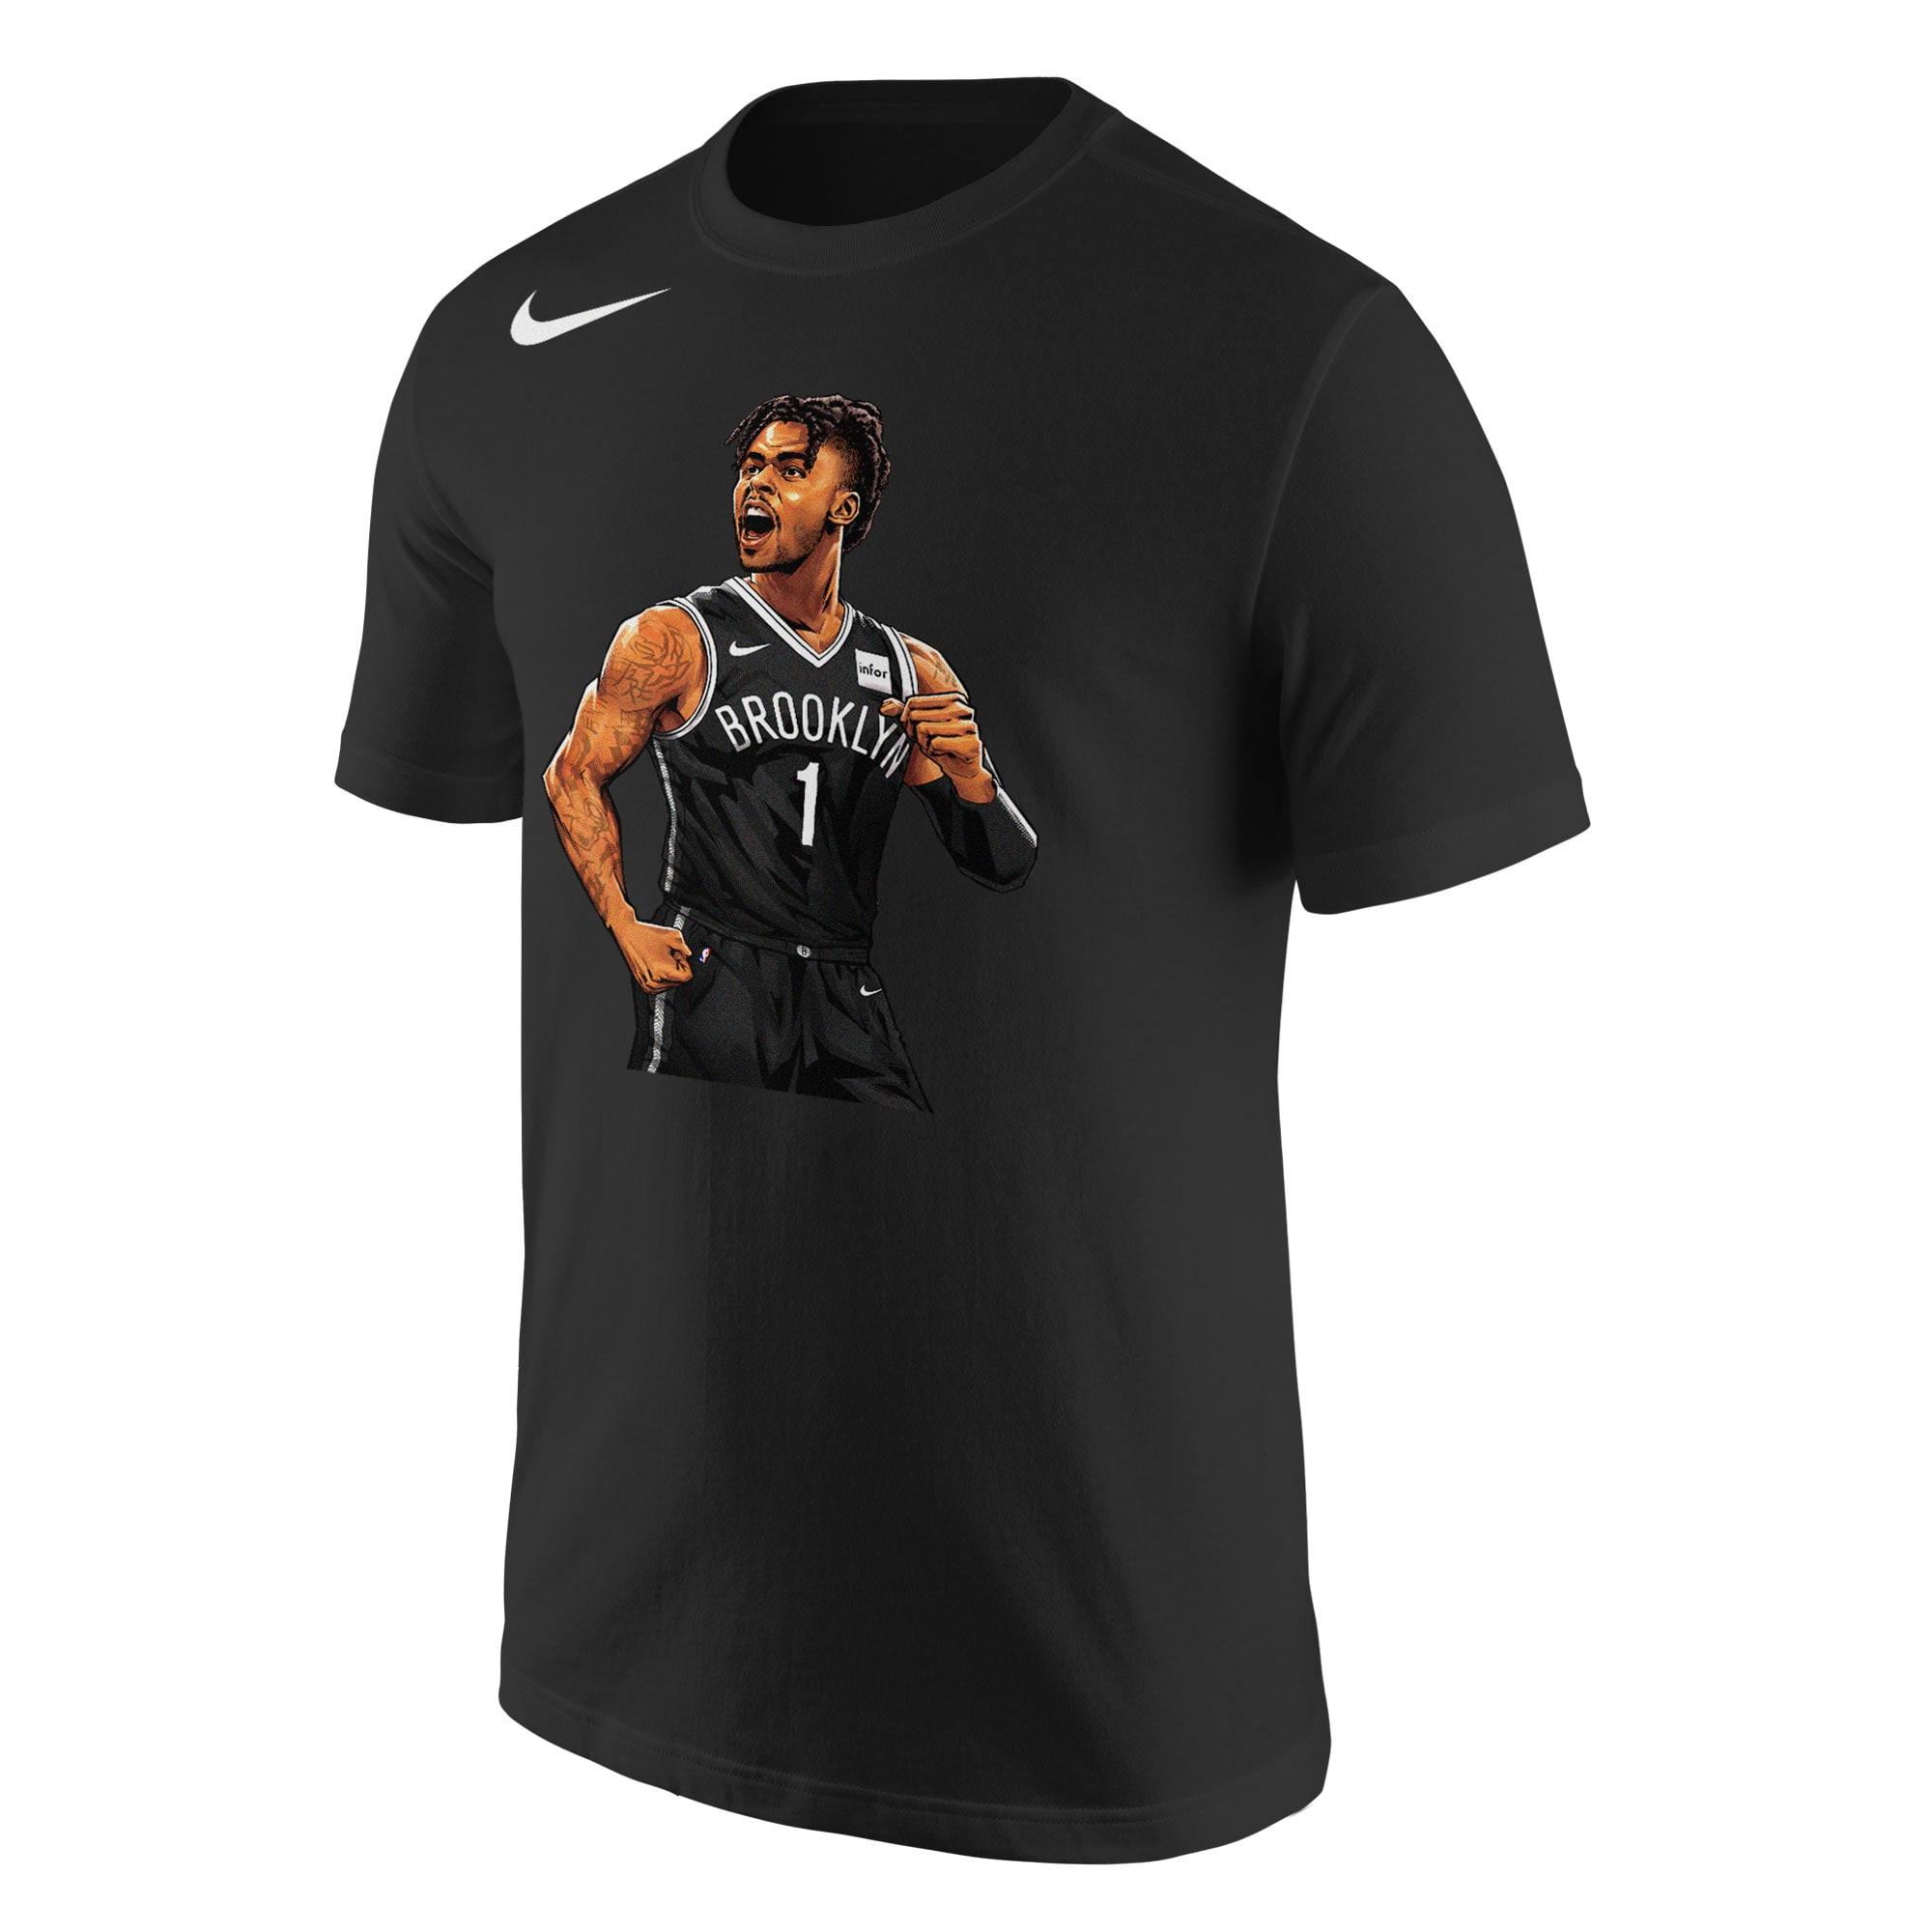 D'Angelo Russell Brooklyn Nets Nike 2019 NBA Playoffs Bound Hero T-Shirt - Black